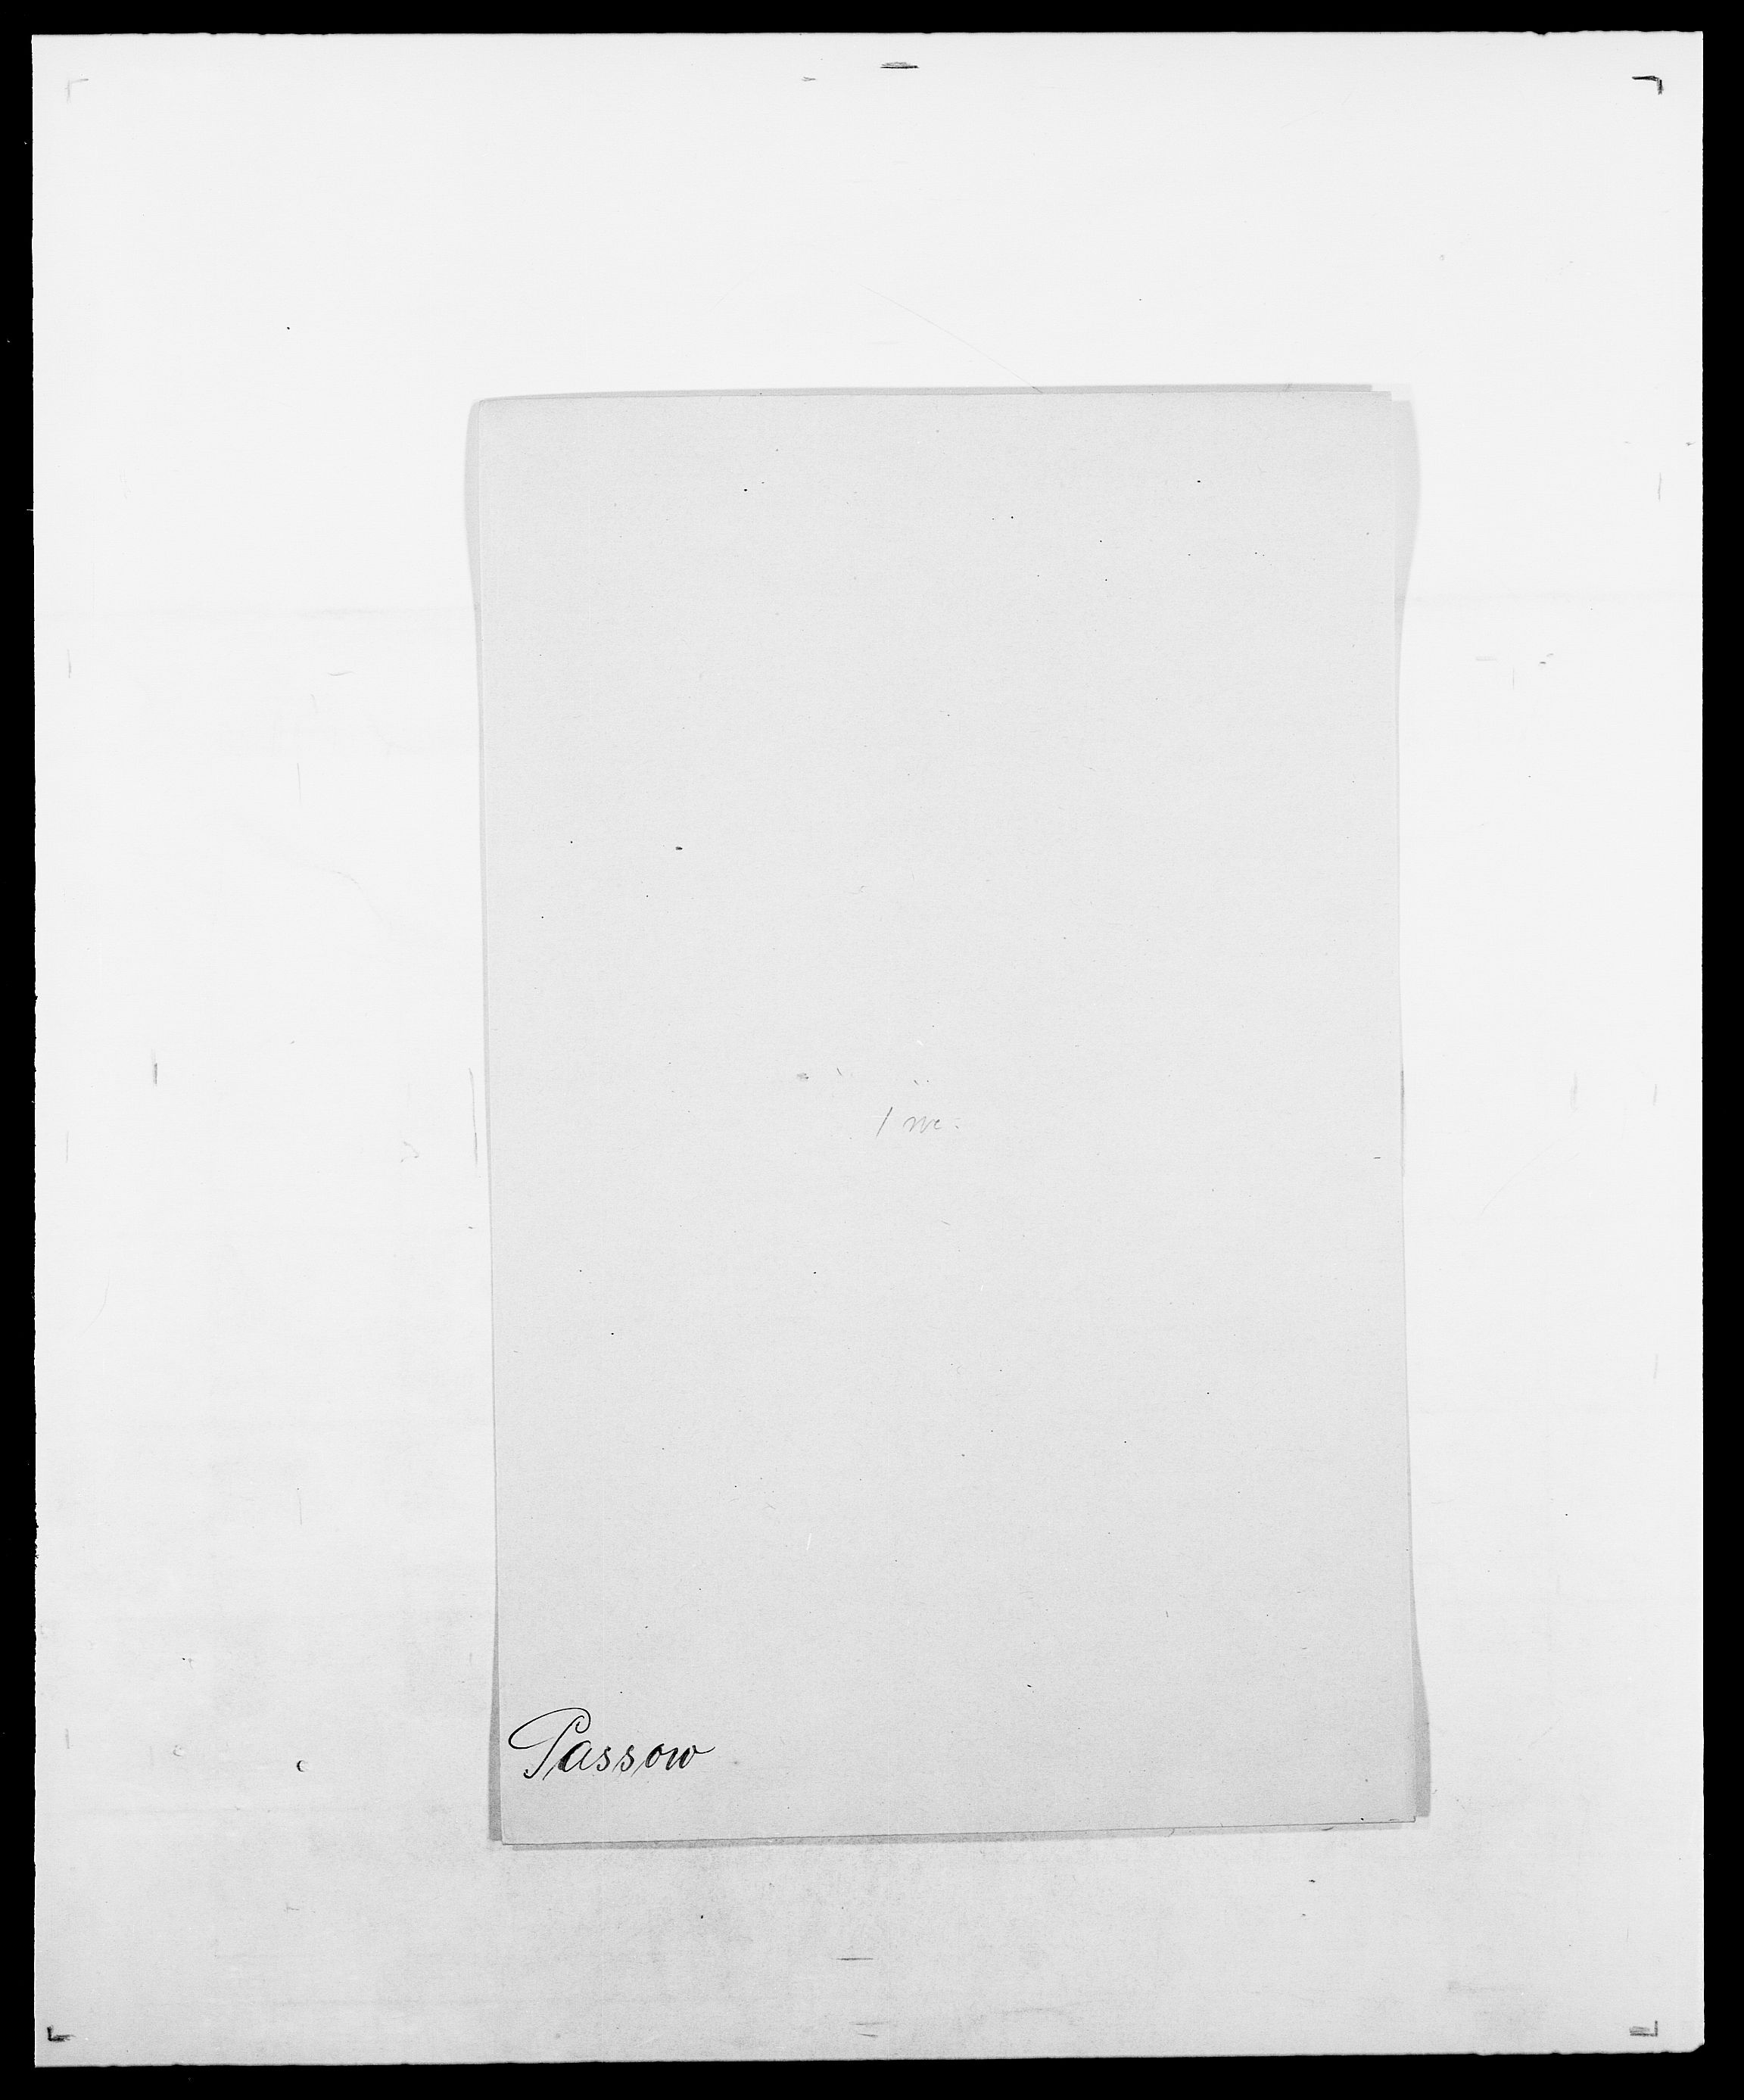 SAO, Delgobe, Charles Antoine - samling, D/Da/L0030: Paars - Pittelkov, s. 145